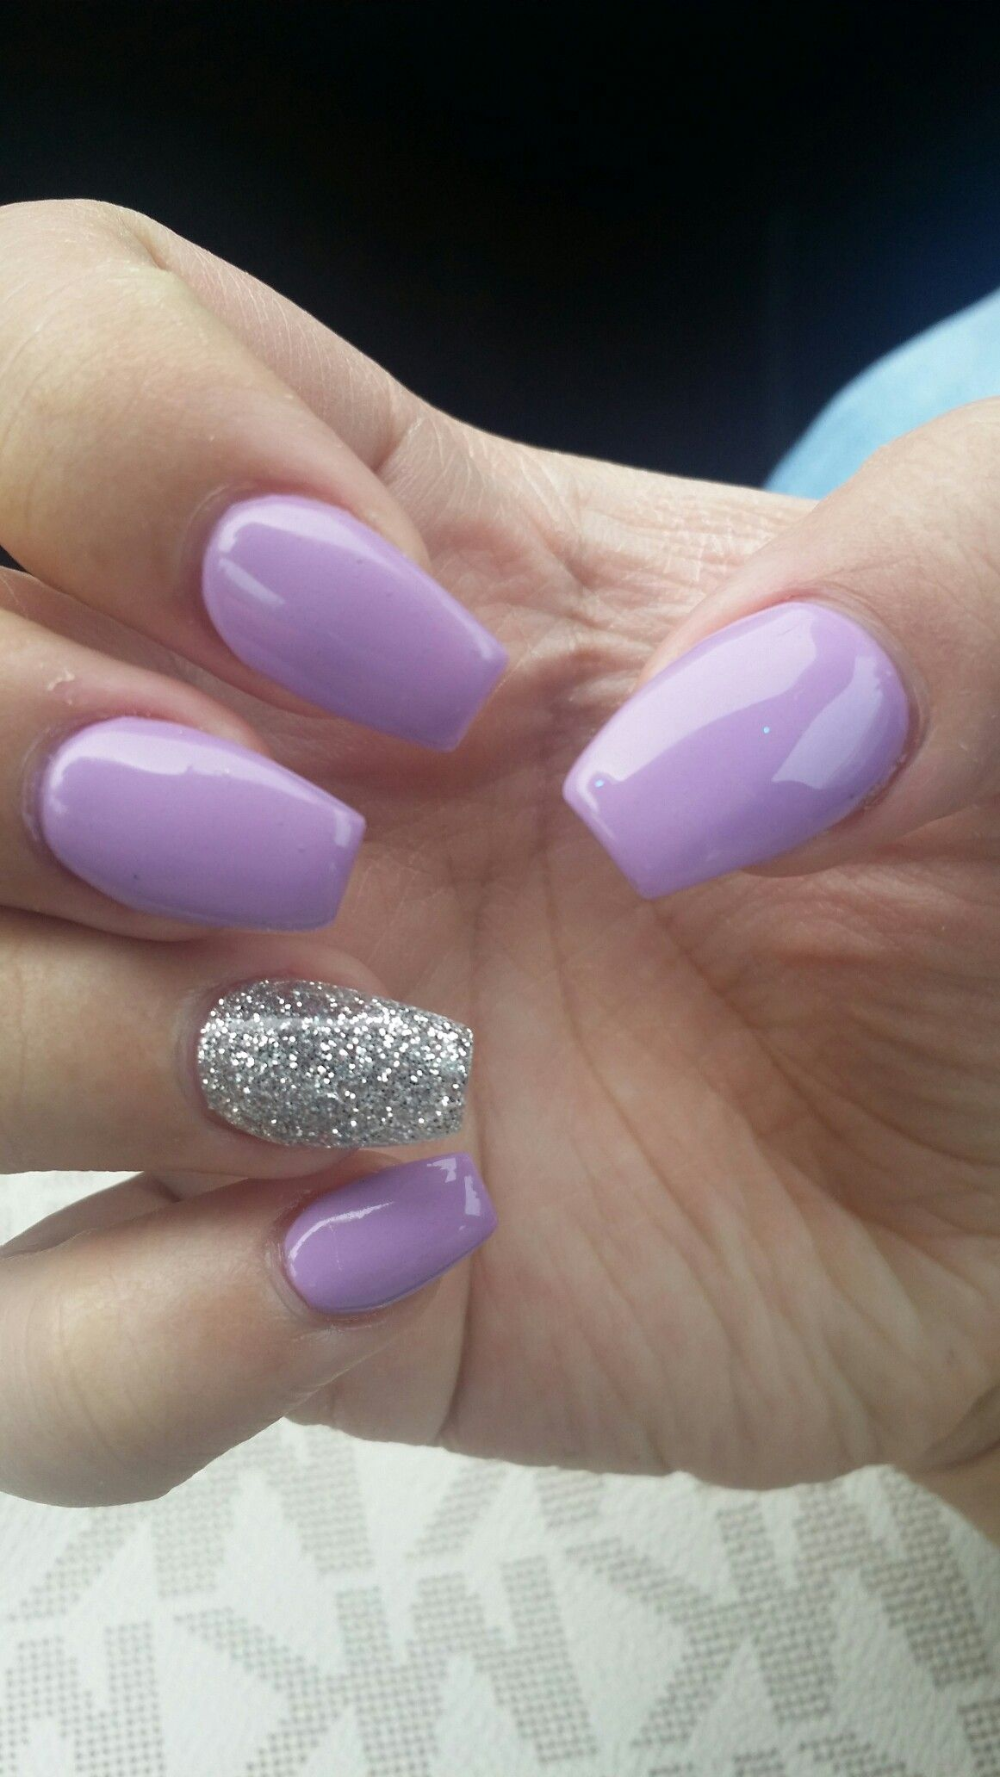 Nail Design Nails Acrylic Elegance Designs With Rhinestones Purple Green Silver Ideas Black And Pink White Lilac Nails Purple Acrylic Nails Ring Finger Nails